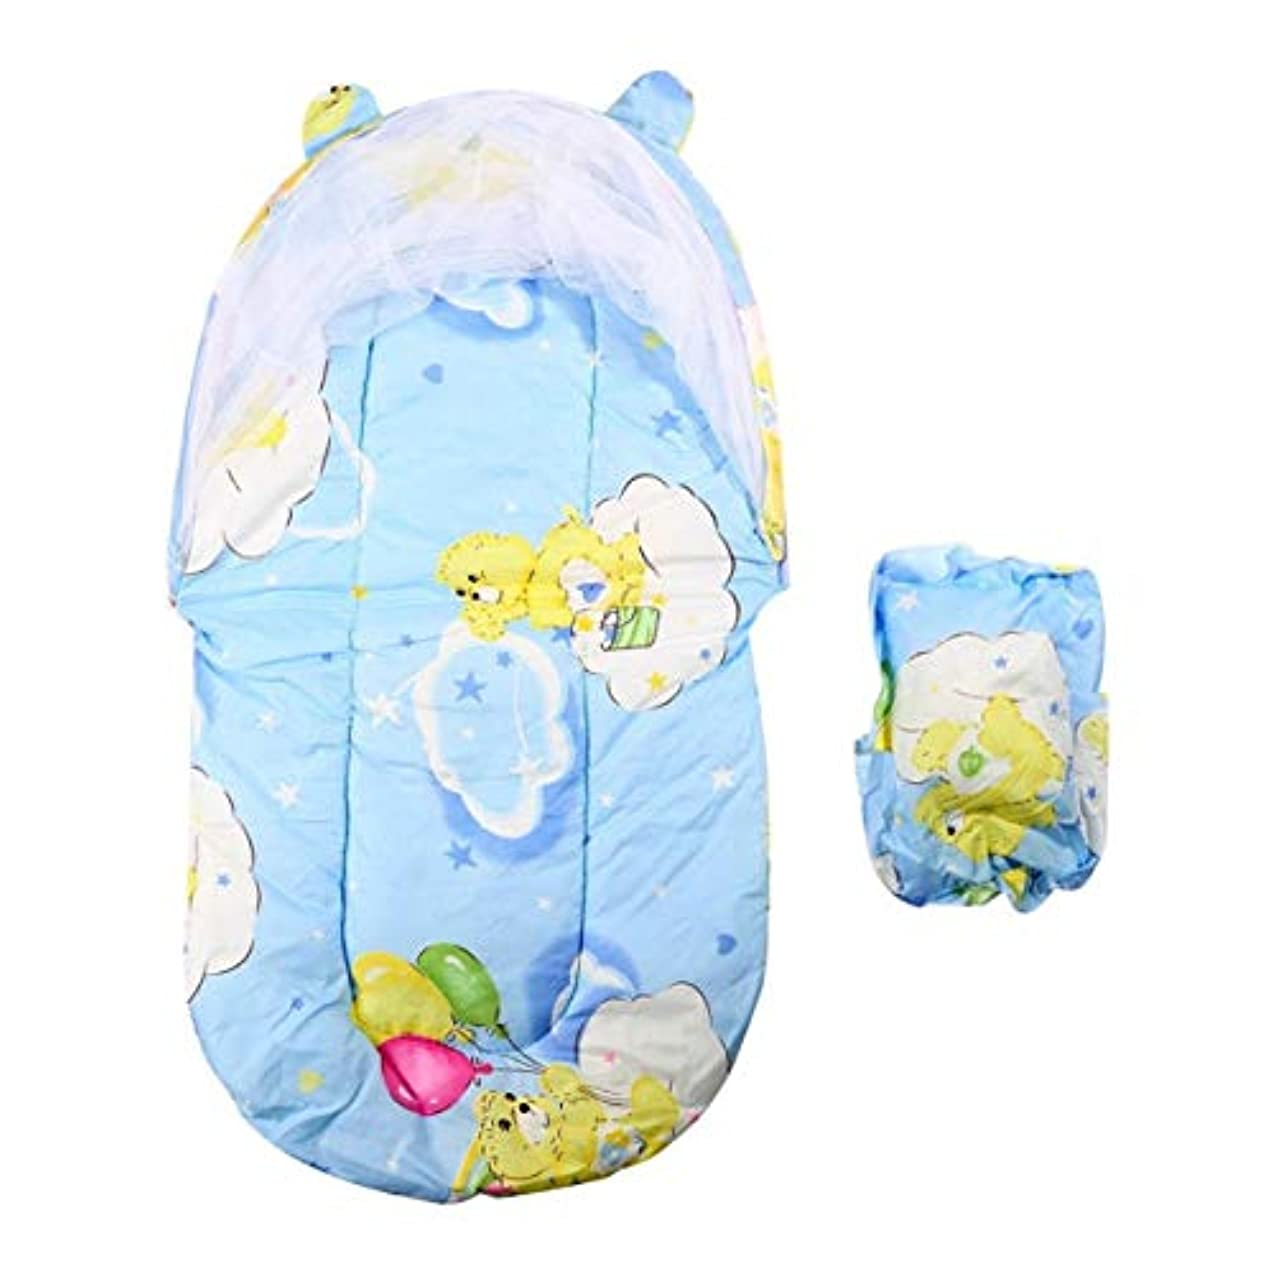 Saikogoods 折り畳み式の新しい赤ん坊の綿パッド入りマットレス幼児枕ベッド蚊帳テントはキッズベビーベッドアクセサリーハングドームフロアスタンド 青